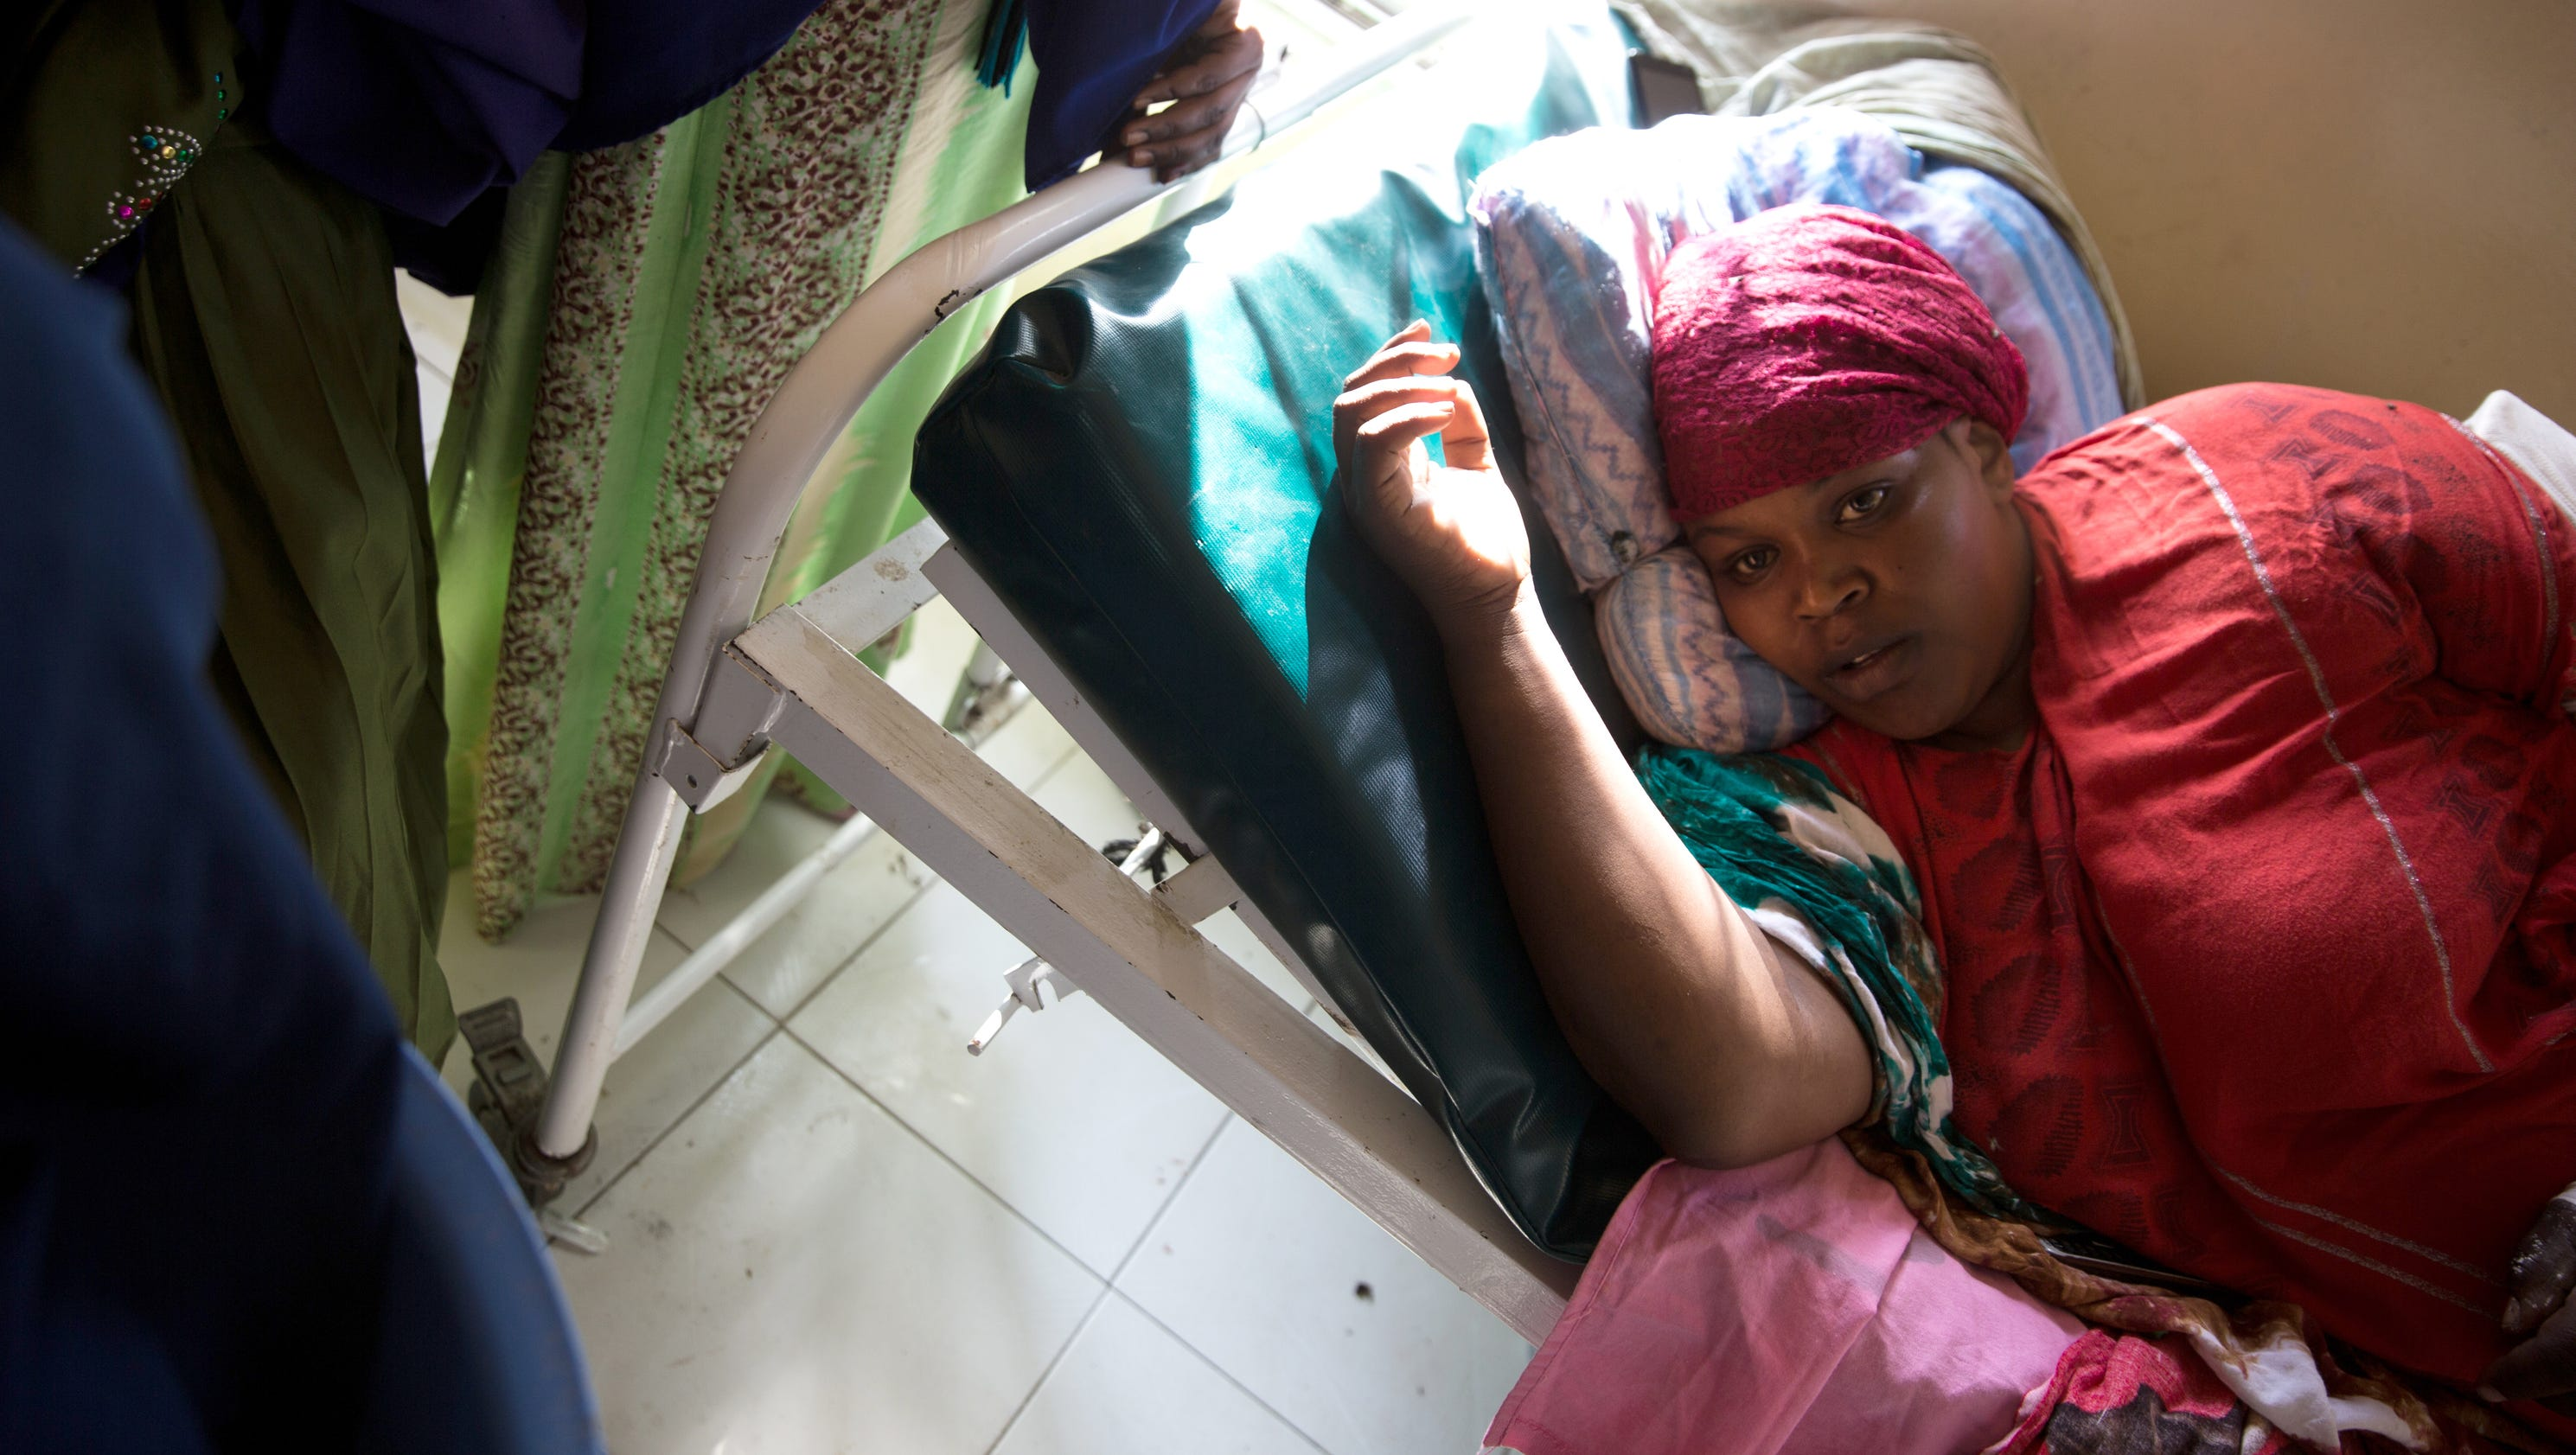 Every call could bring bad news: Mogadishu bomb impact